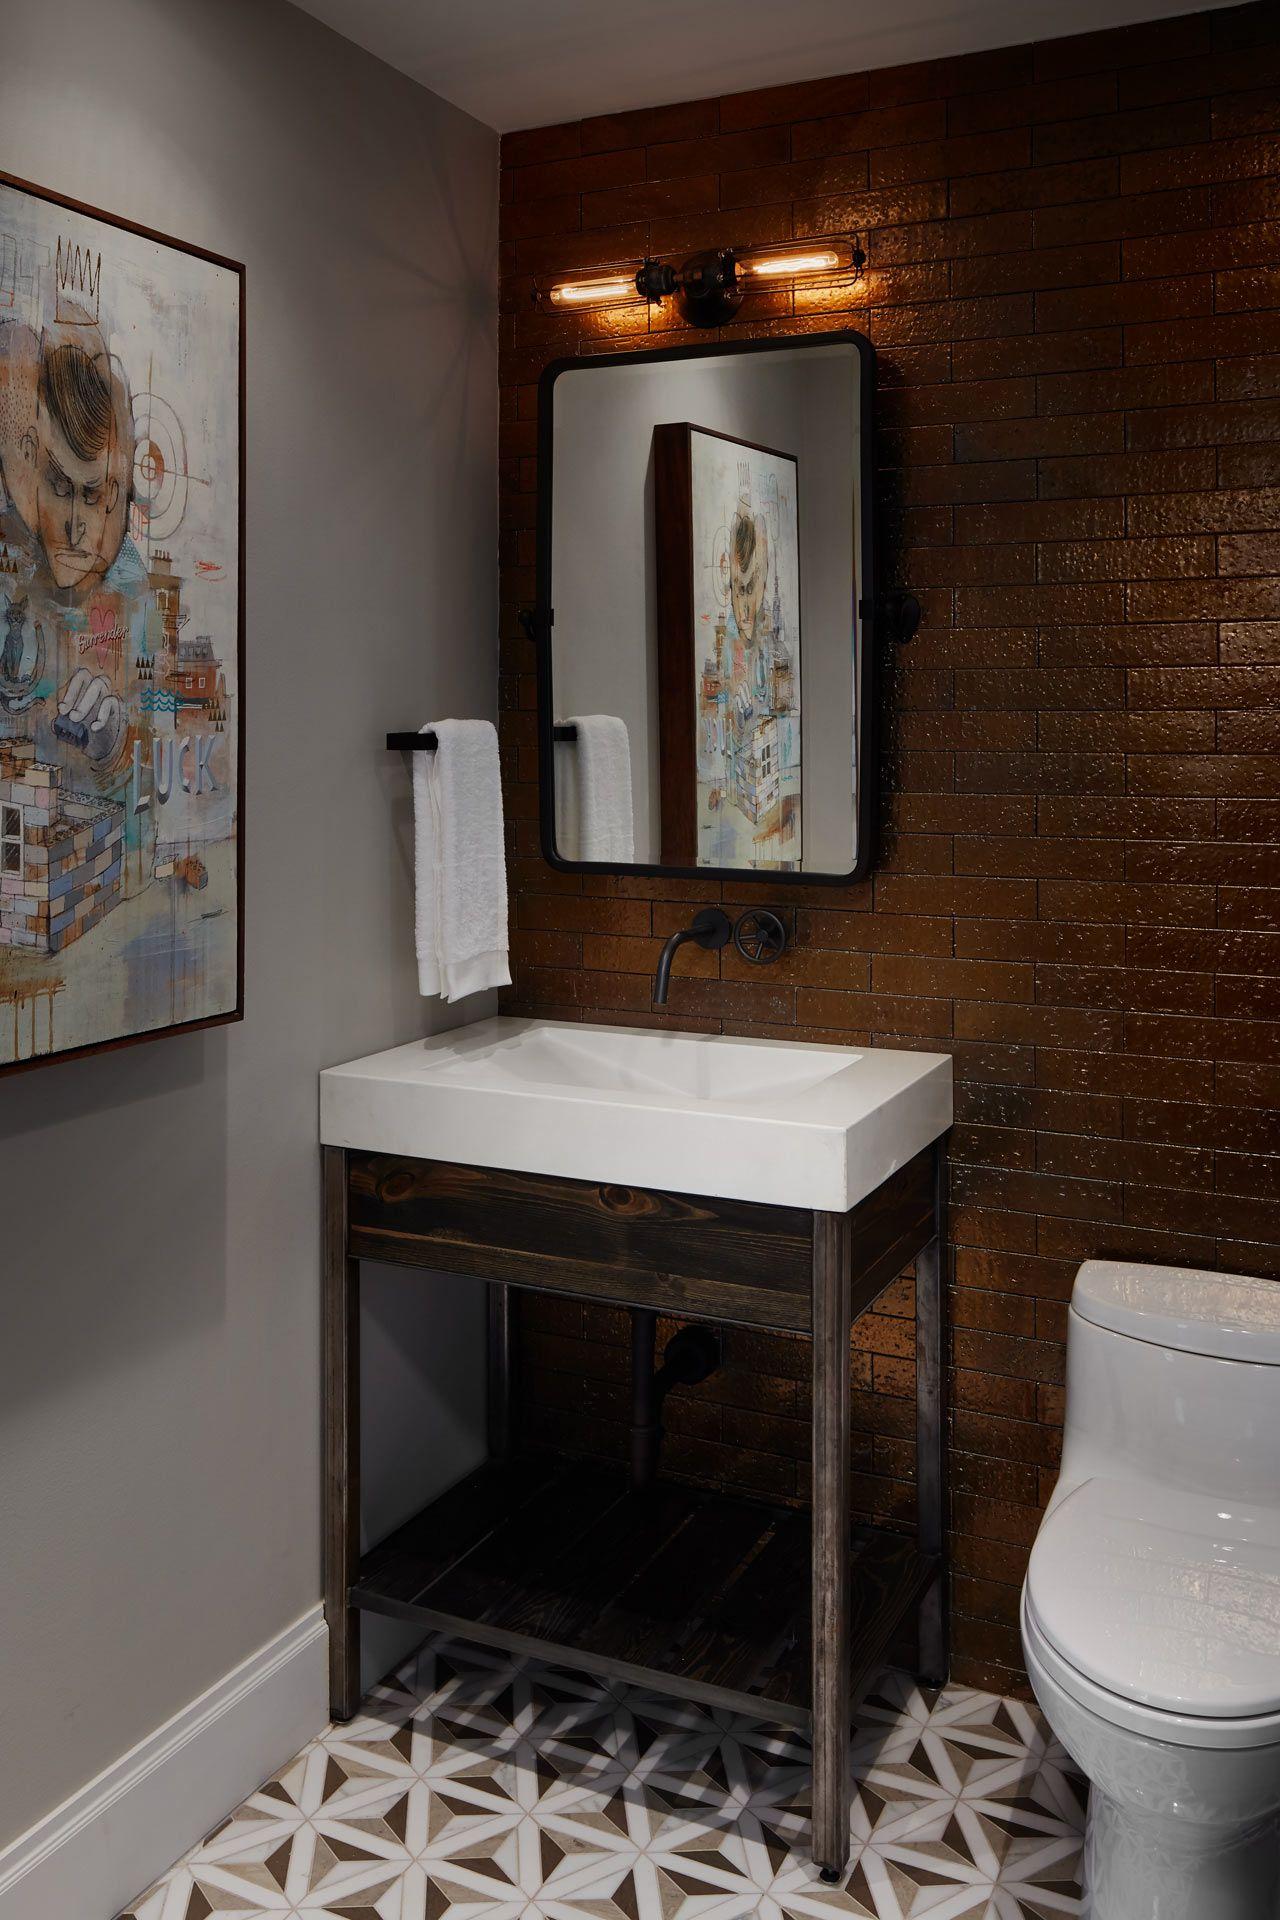 Inspired Interiors Bachelor Pad 8 Design Milk Chicago Interior Design Bathroom Design Decor Bachelor Pad